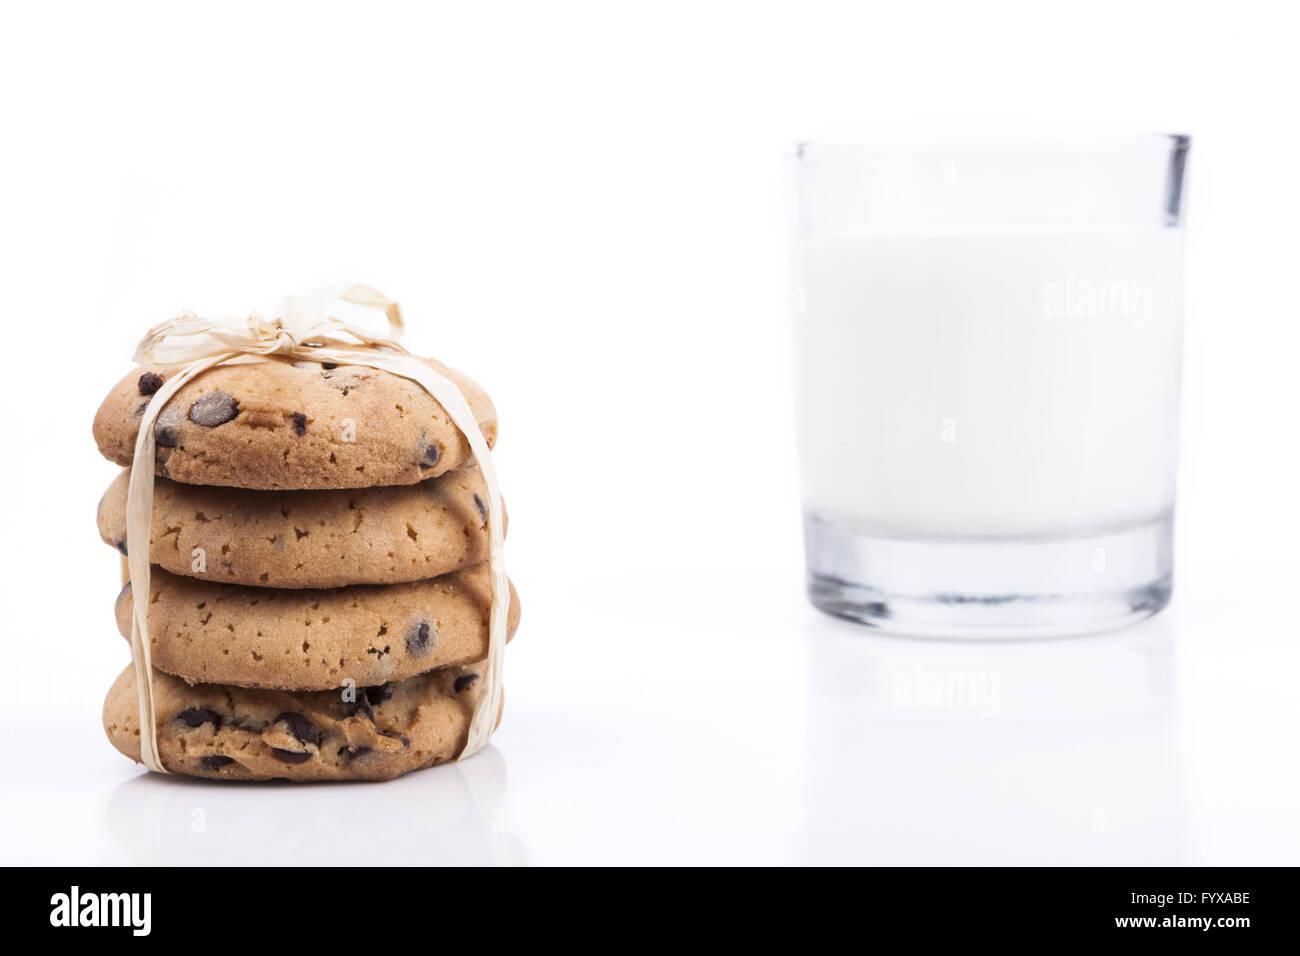 Tied Cookies - Stock Image